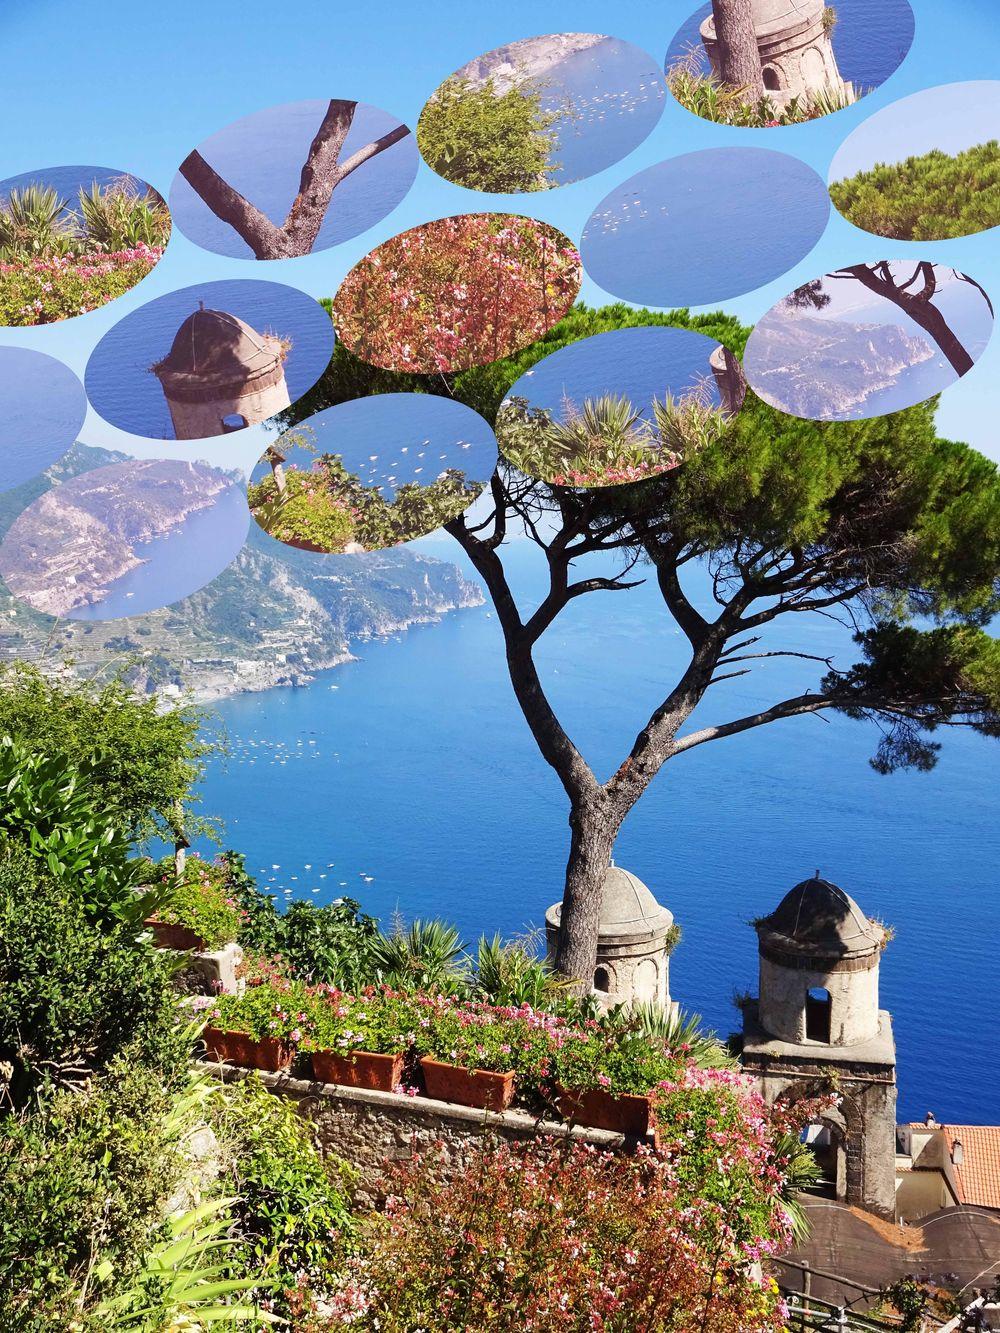 Italian coast - image 1 - student project